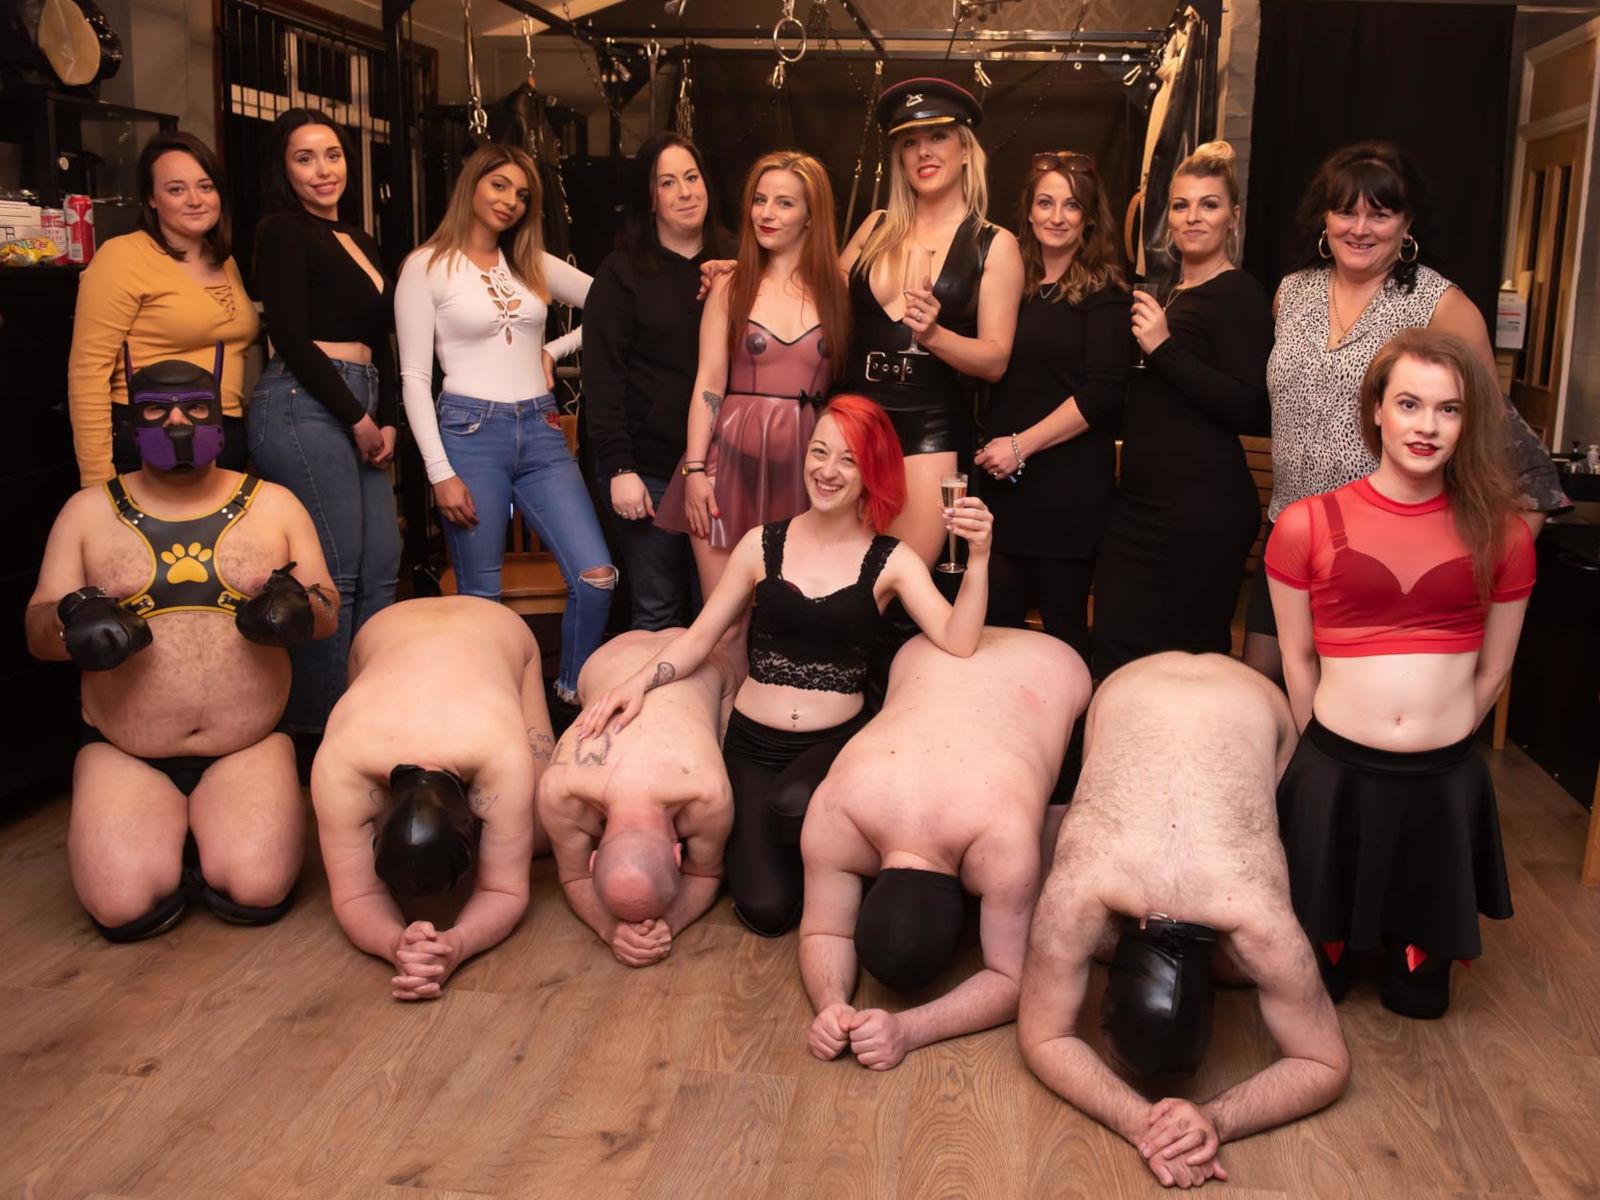 Mistress_Tess_Vanilla_Corruption_ Parties_Peterborough_Cambridgeshire_01